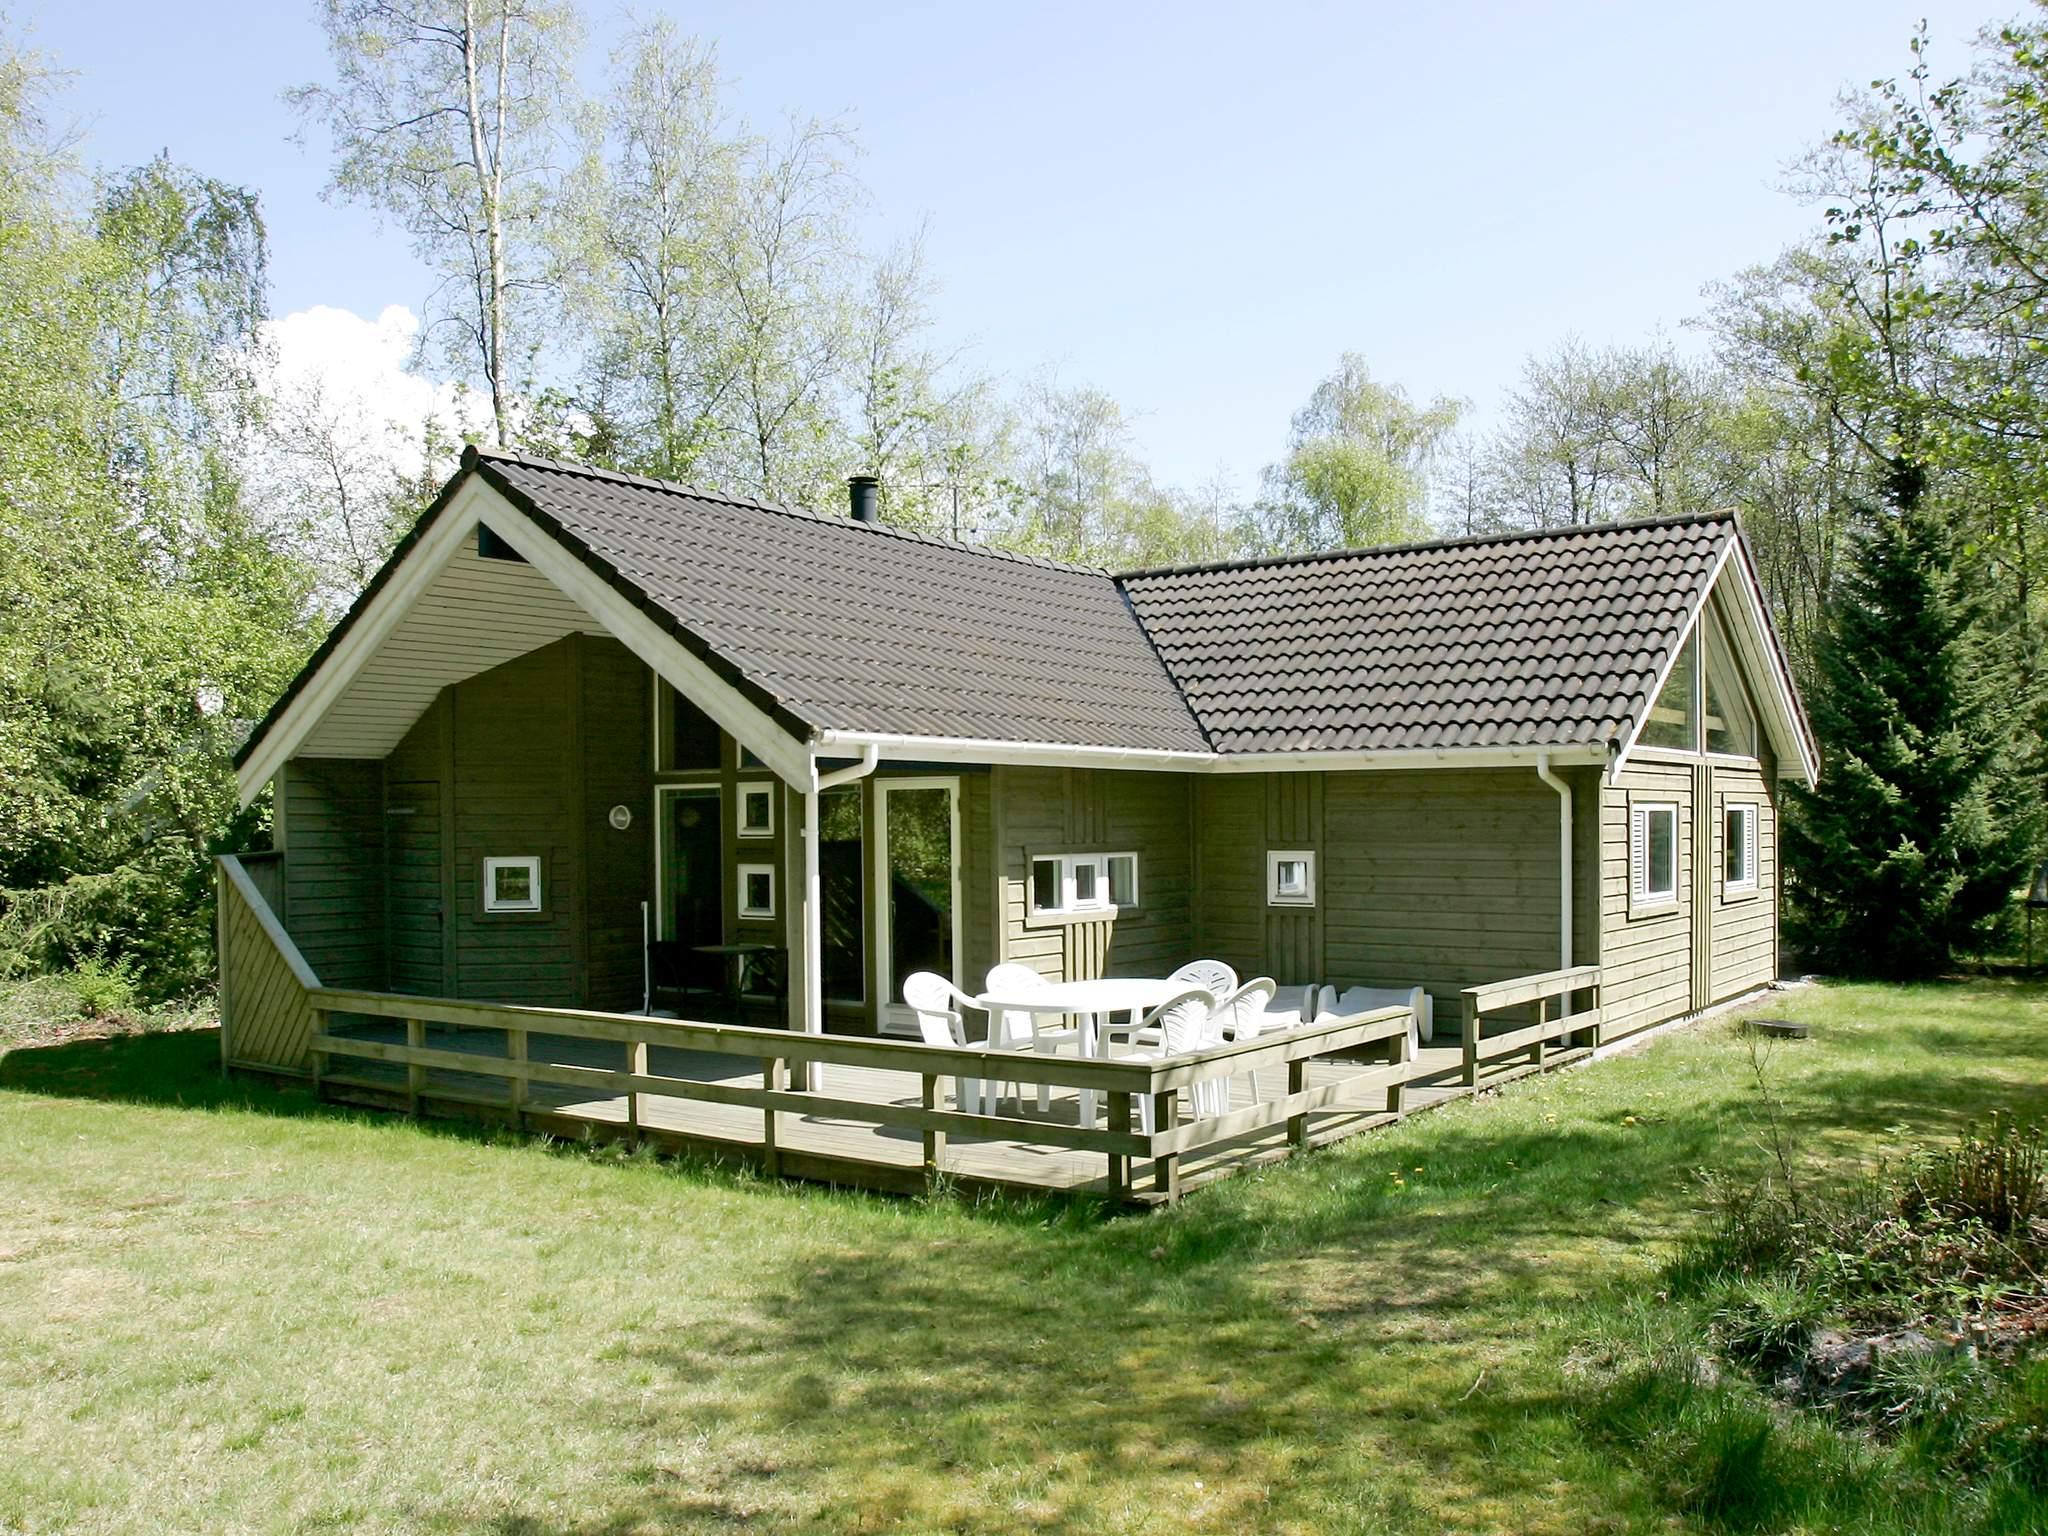 Maison de vacances Østre Sømarken (82542), Aakirkeby, , Bornholm, Danemark, image 1